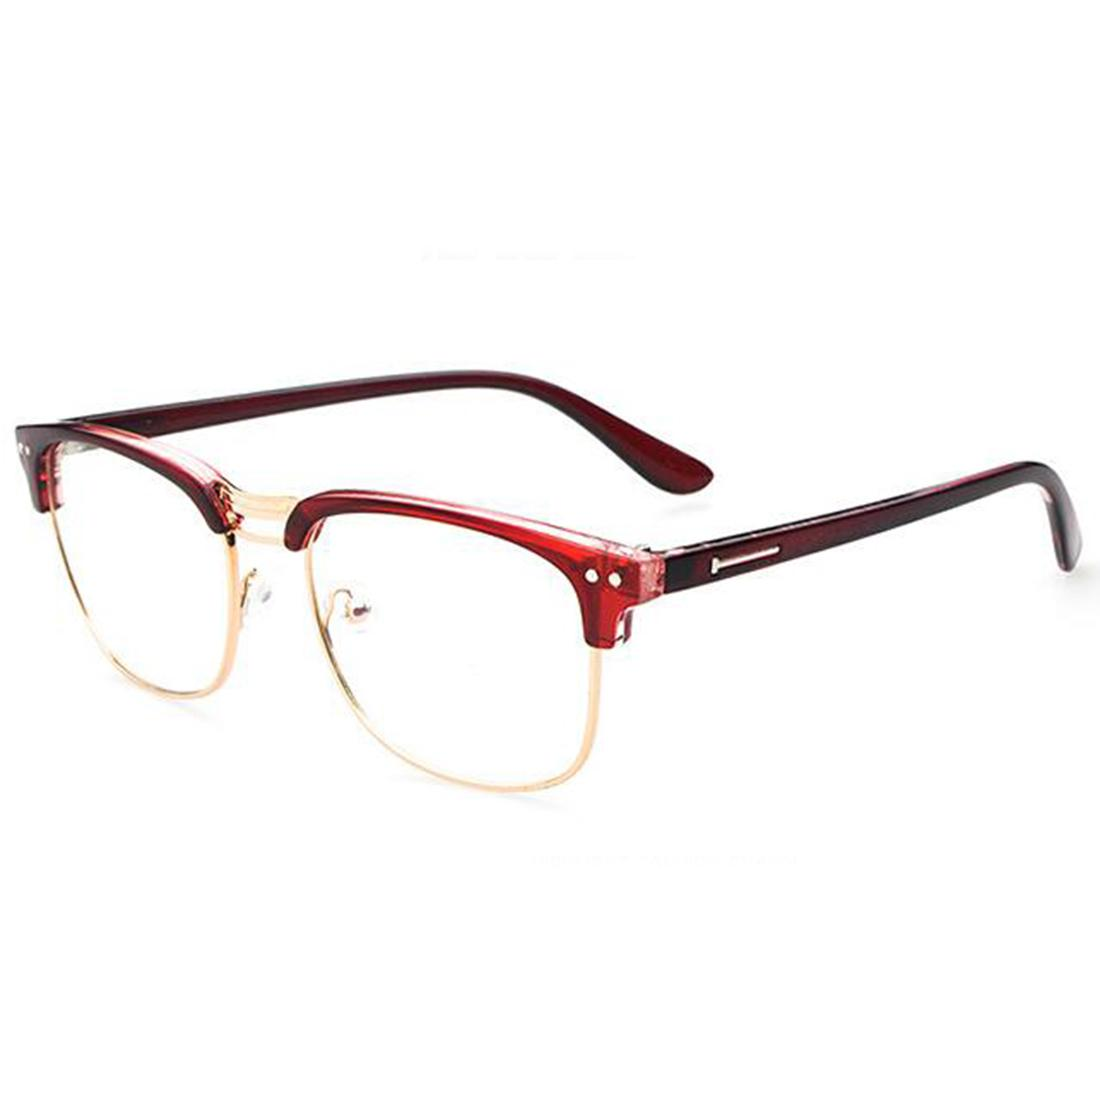 a0adcf665ac Wholesale- Fashion Metal Half Frame Glasses Frame Retro Women Men ...